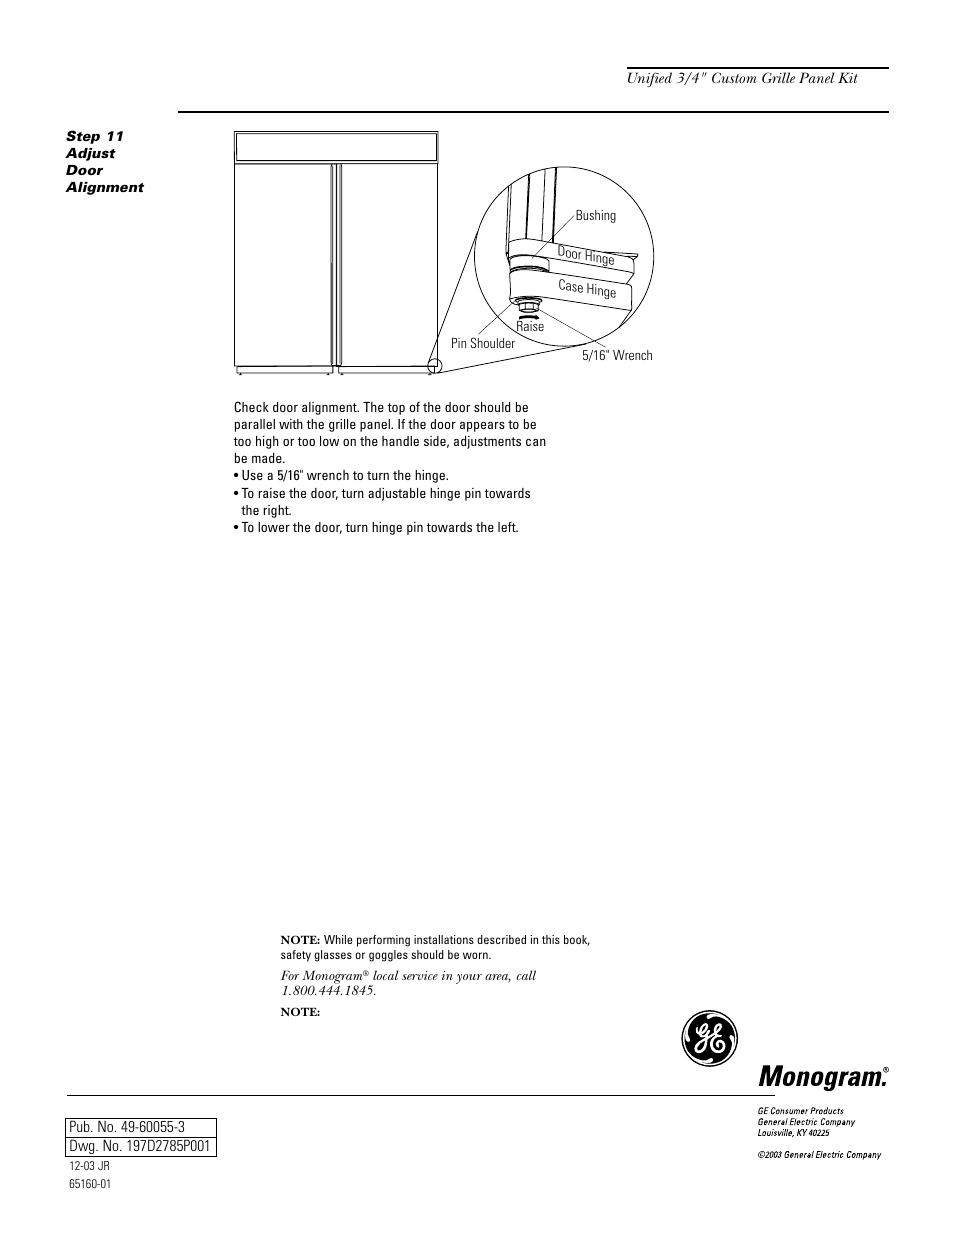 Ge Door User Manual Pin Simple Plant Cell Diagram For Kids 5610jpg Picture To Pinterest Array Rh Logoutev De